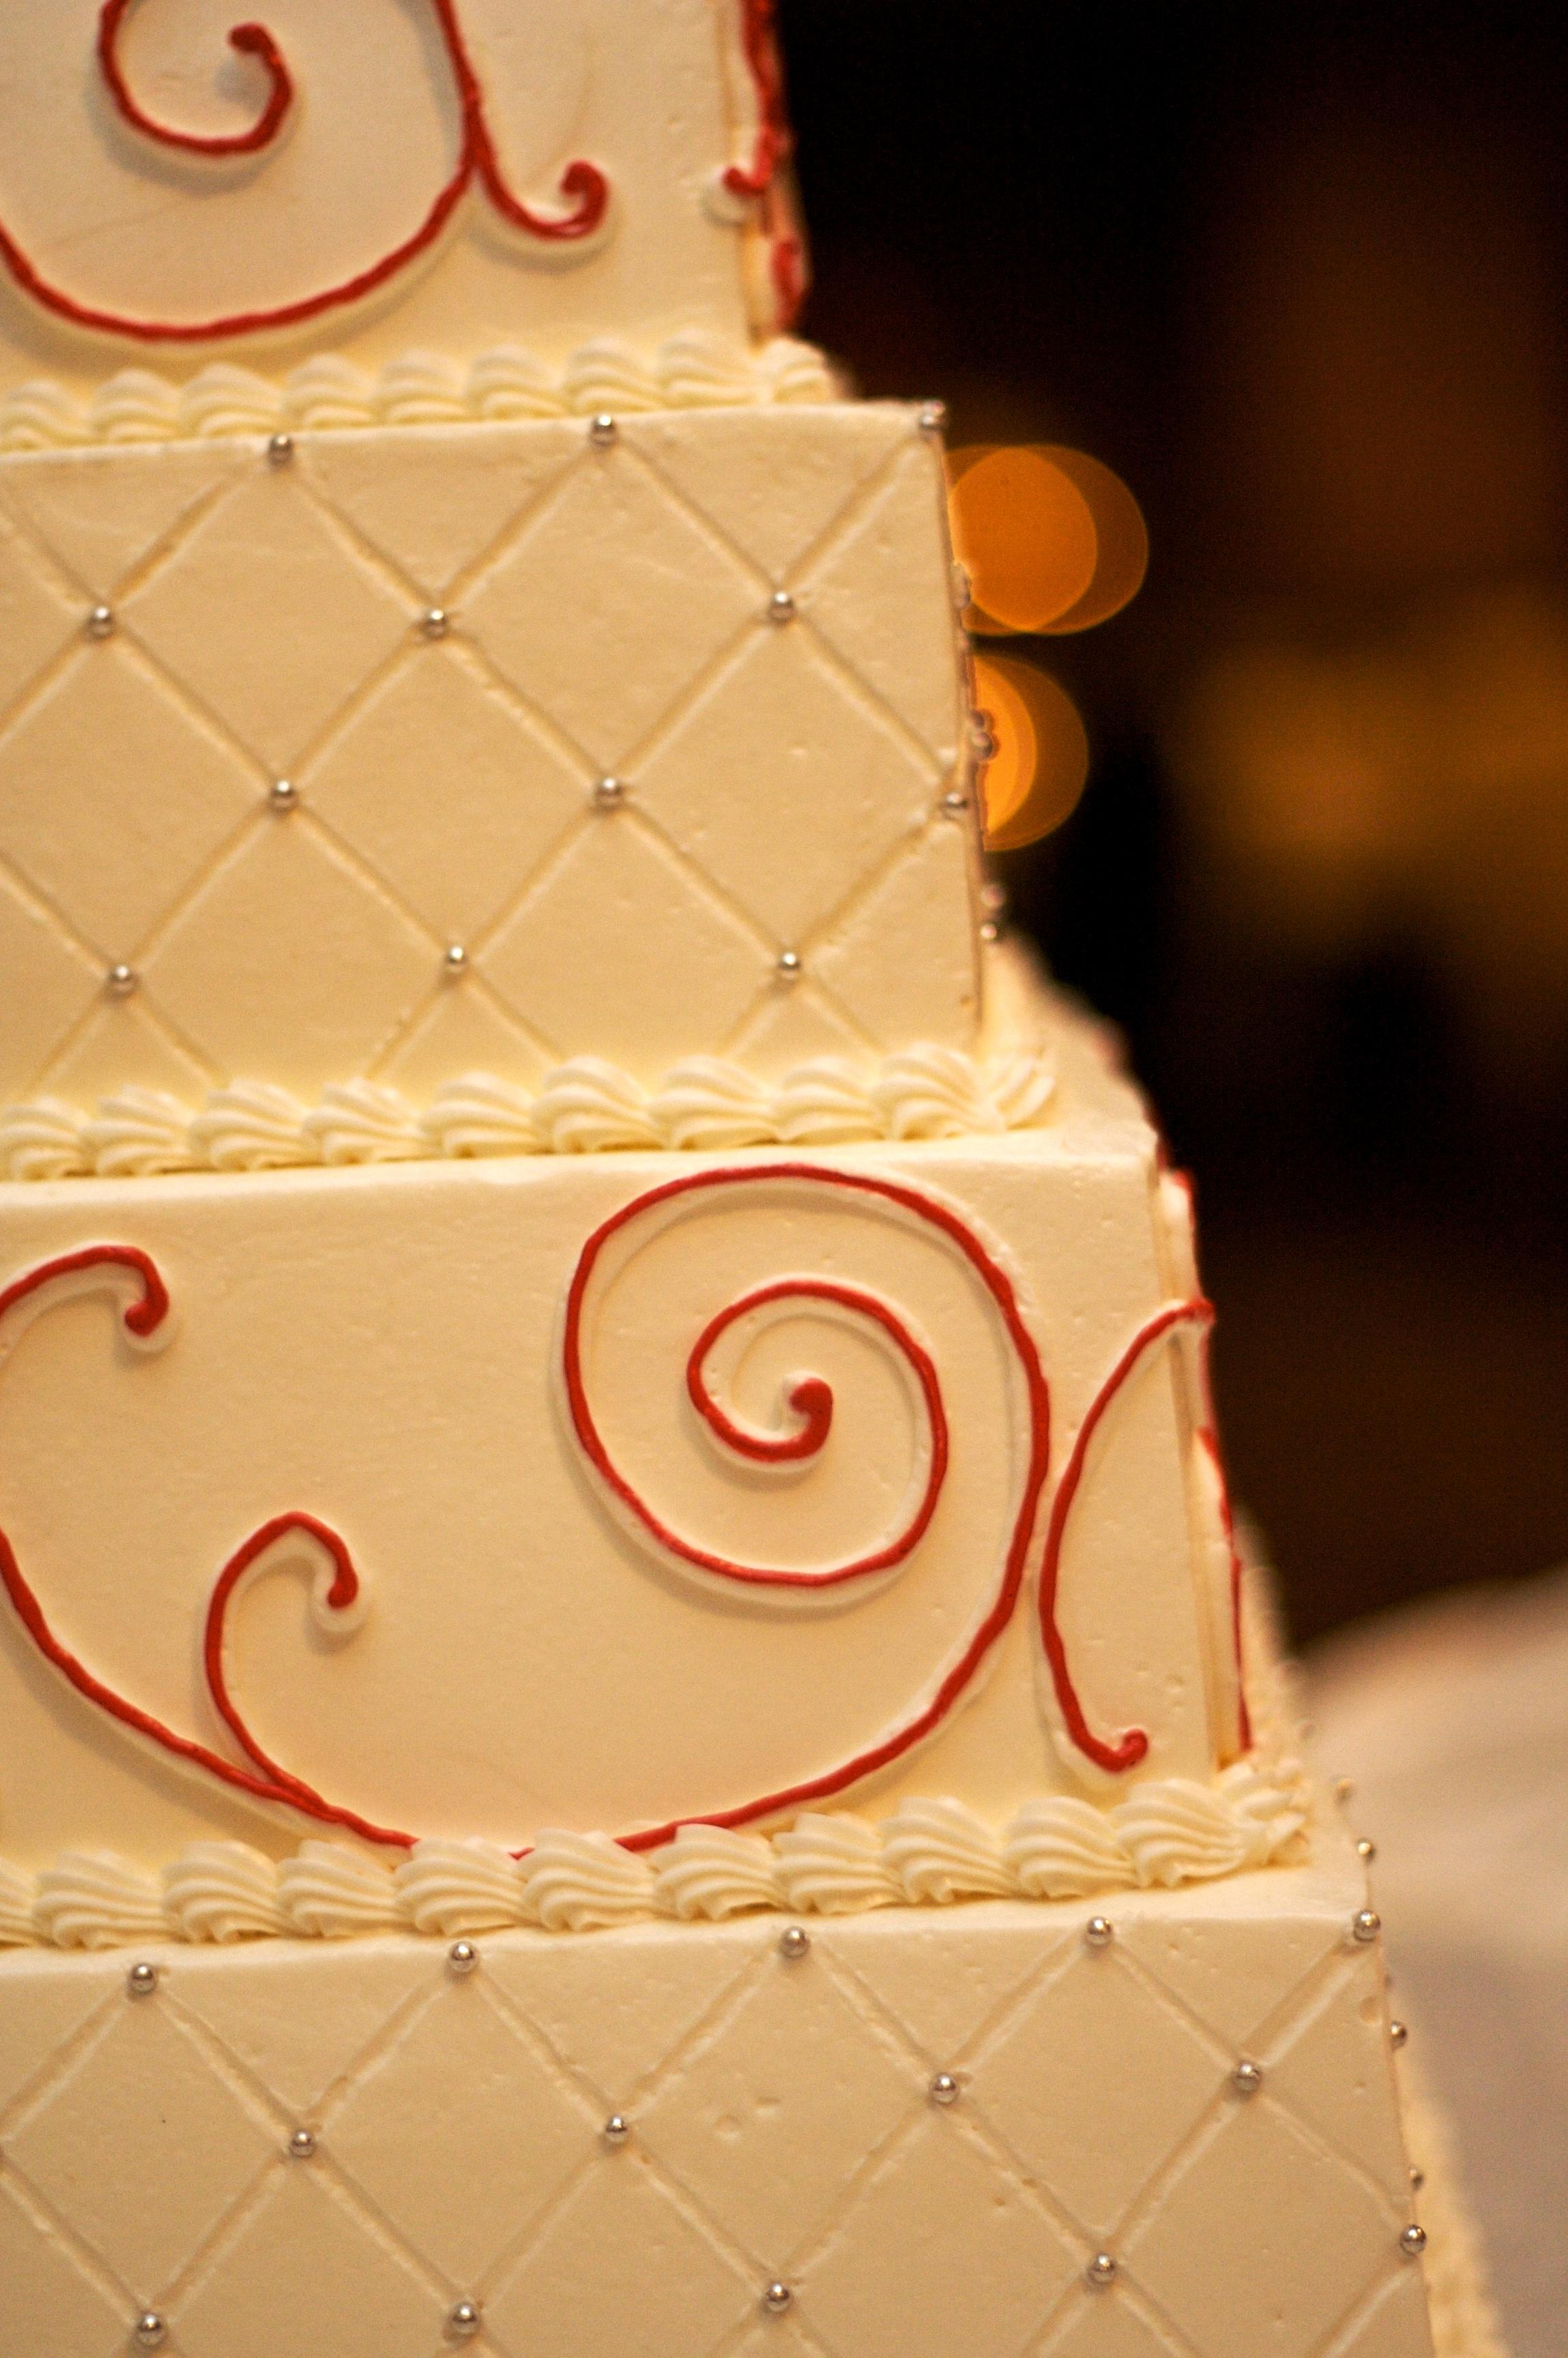 File:Have Your Cake - wedding cake with red swirls.jpg - Wikimedia ...